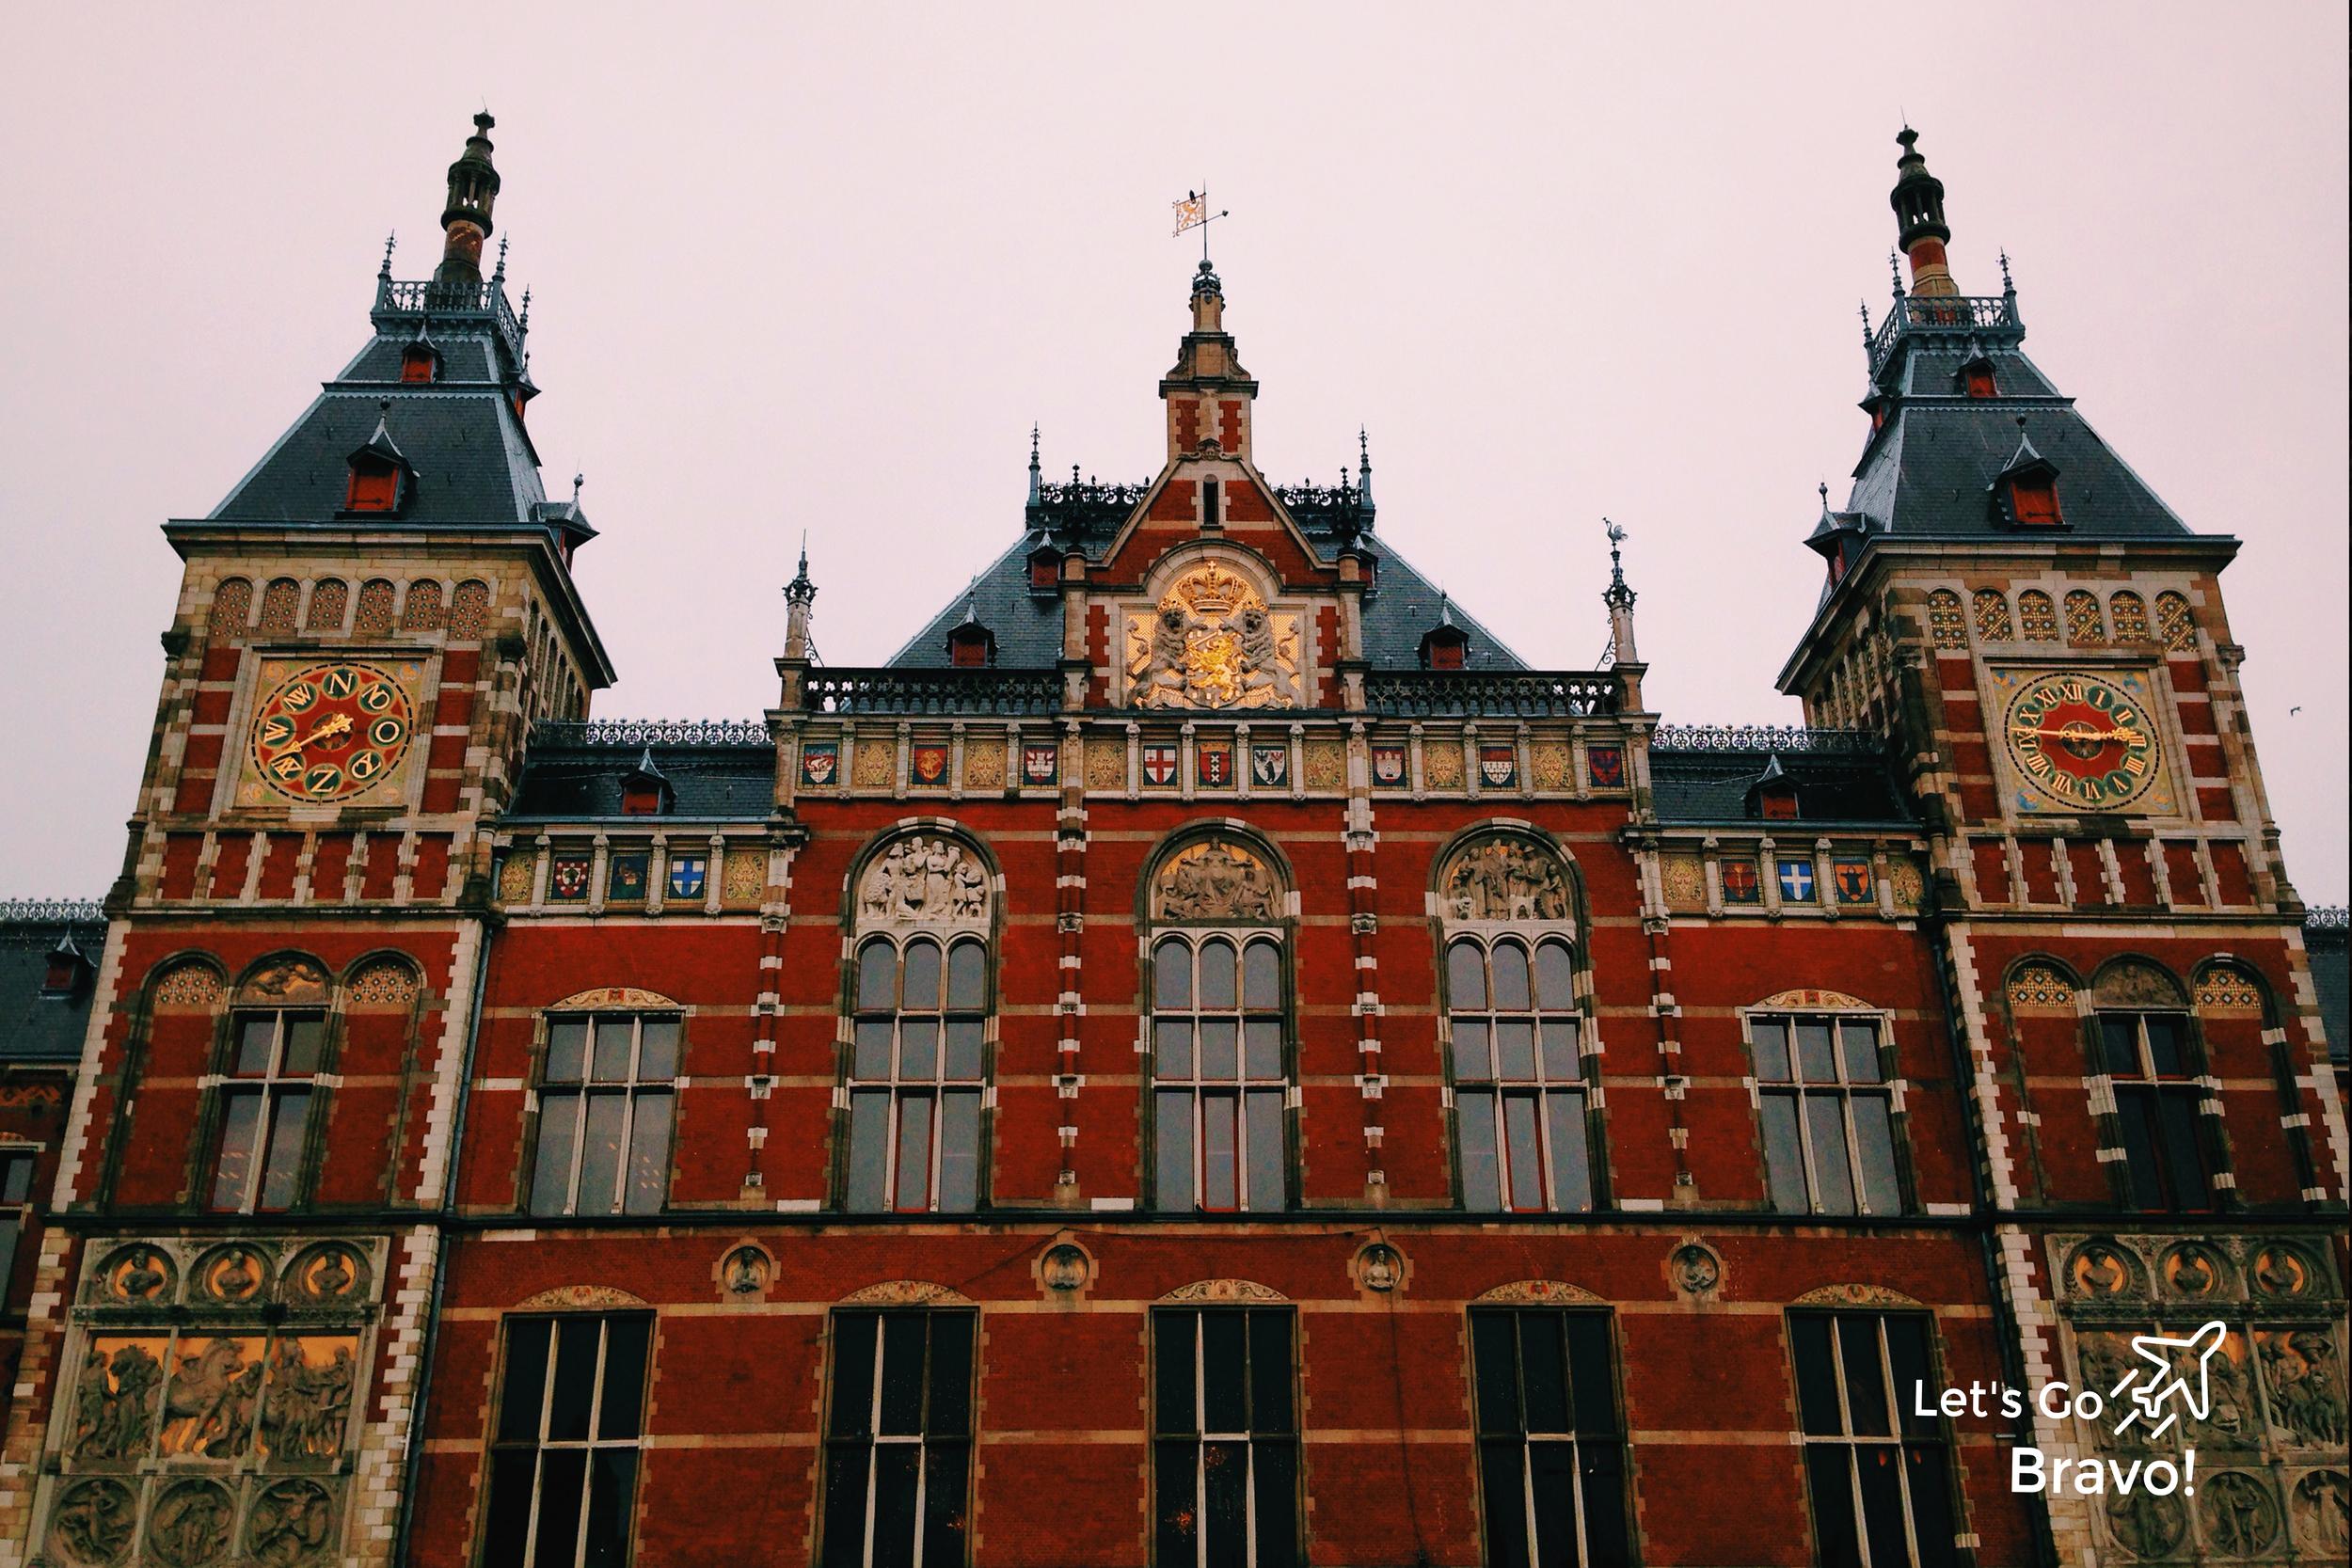 Amsterdam Travel Guide - Let's Go Bravo - Eric Bravo Photography